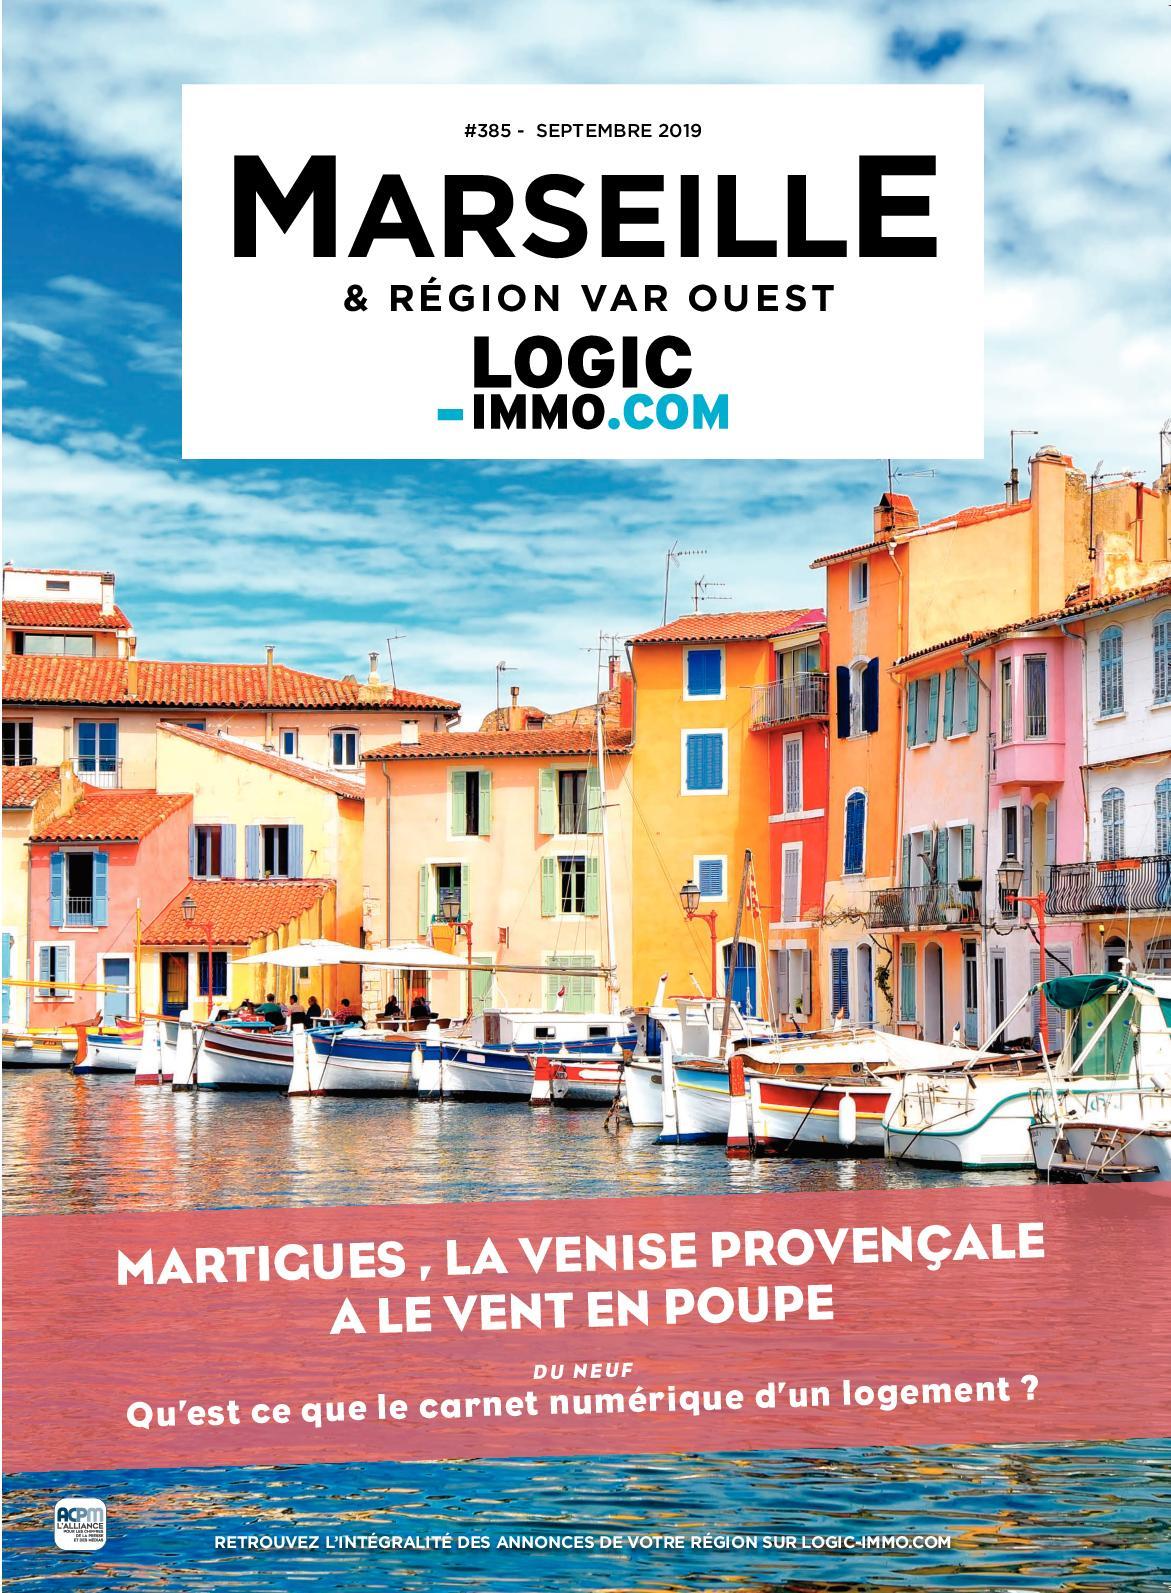 555 Rue Saint Pierre 13012 Marseille calaméo - logic immo marseille et region var ouest #385